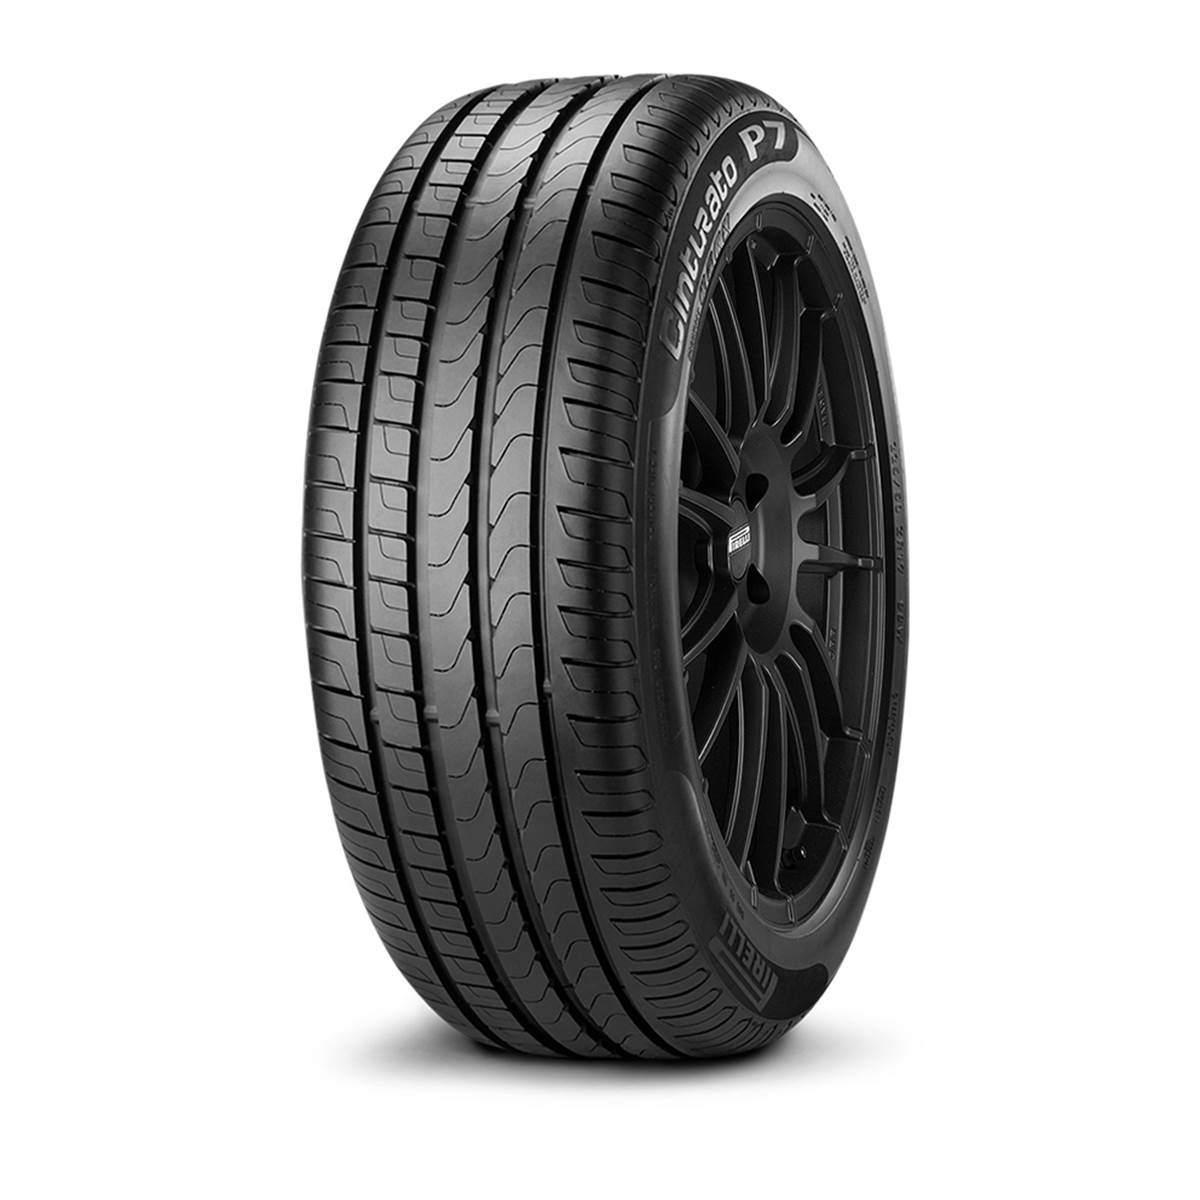 Pneu Runflat Pirelli 225/40R18 92Y Cinturato P7 XL